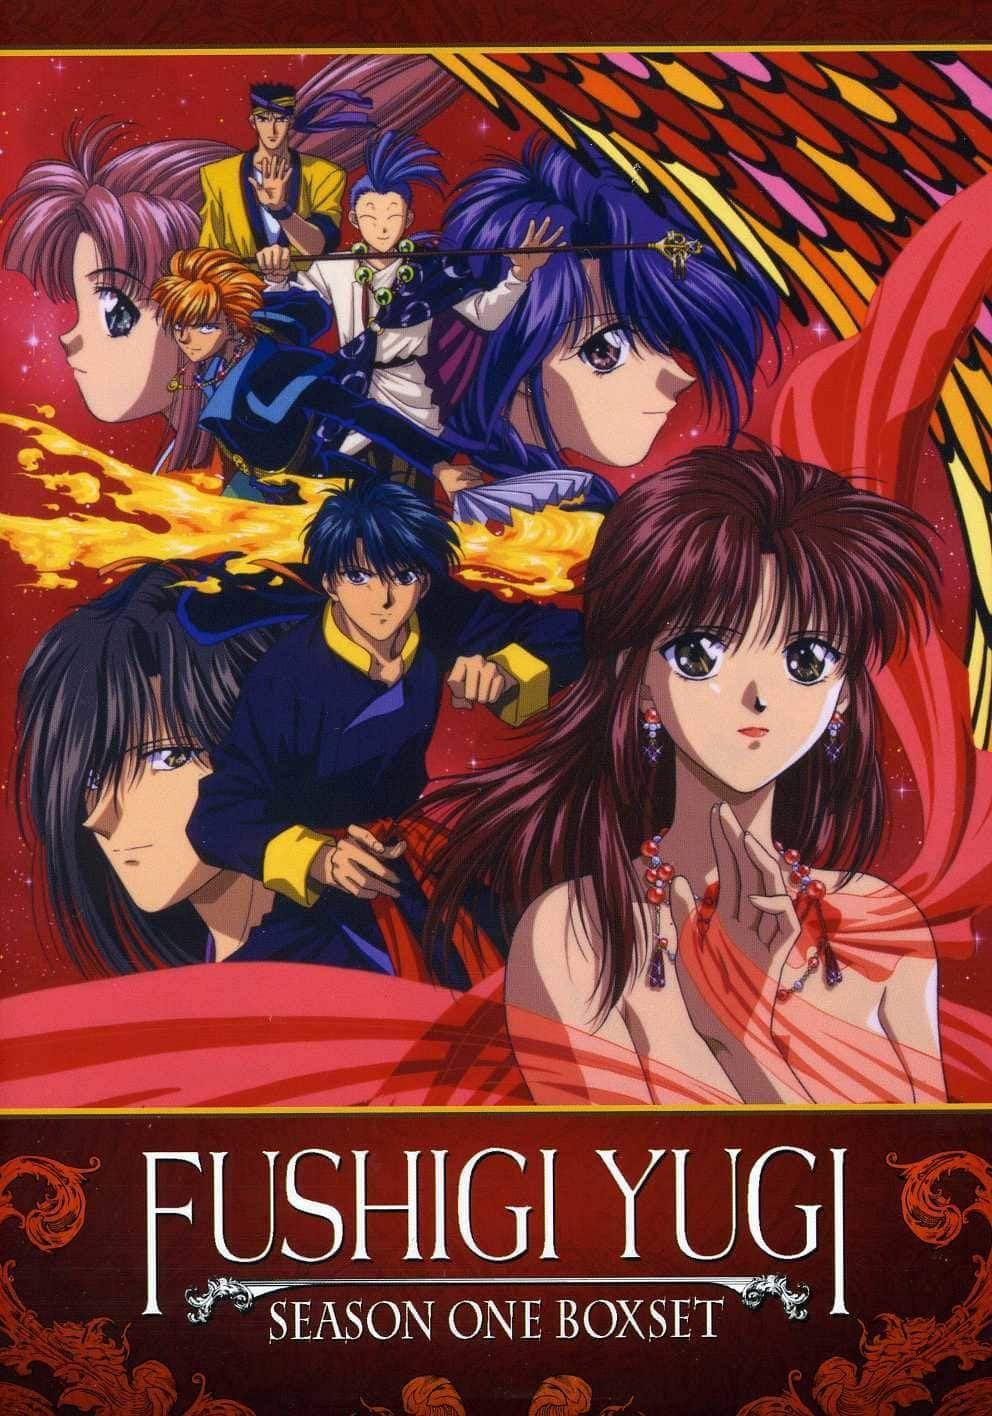 Fushigi Yugi Season One Box Set Fushigi yûgi, Anime